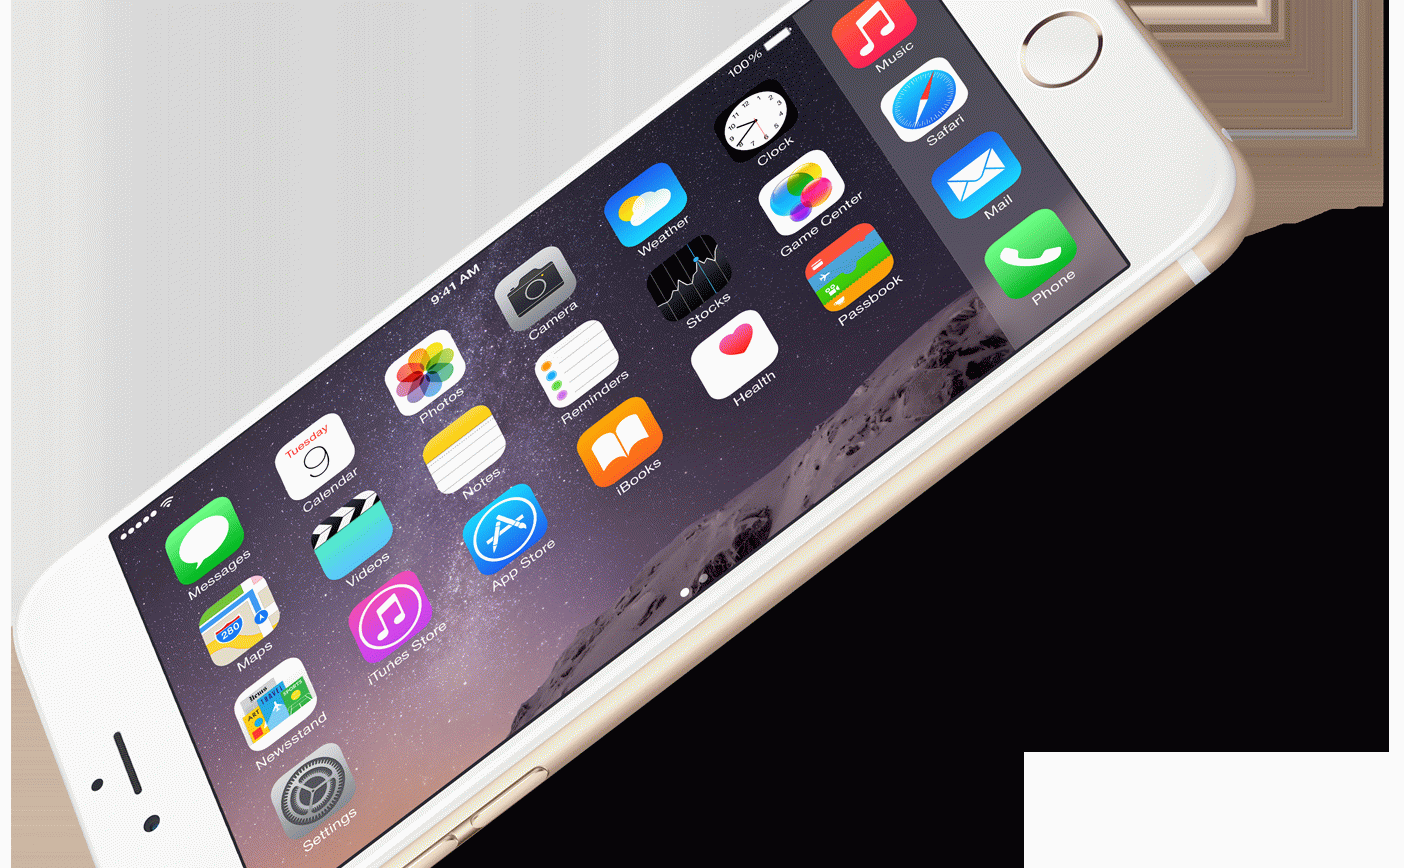 iPhone-6-ladscape-home-screen-sideway